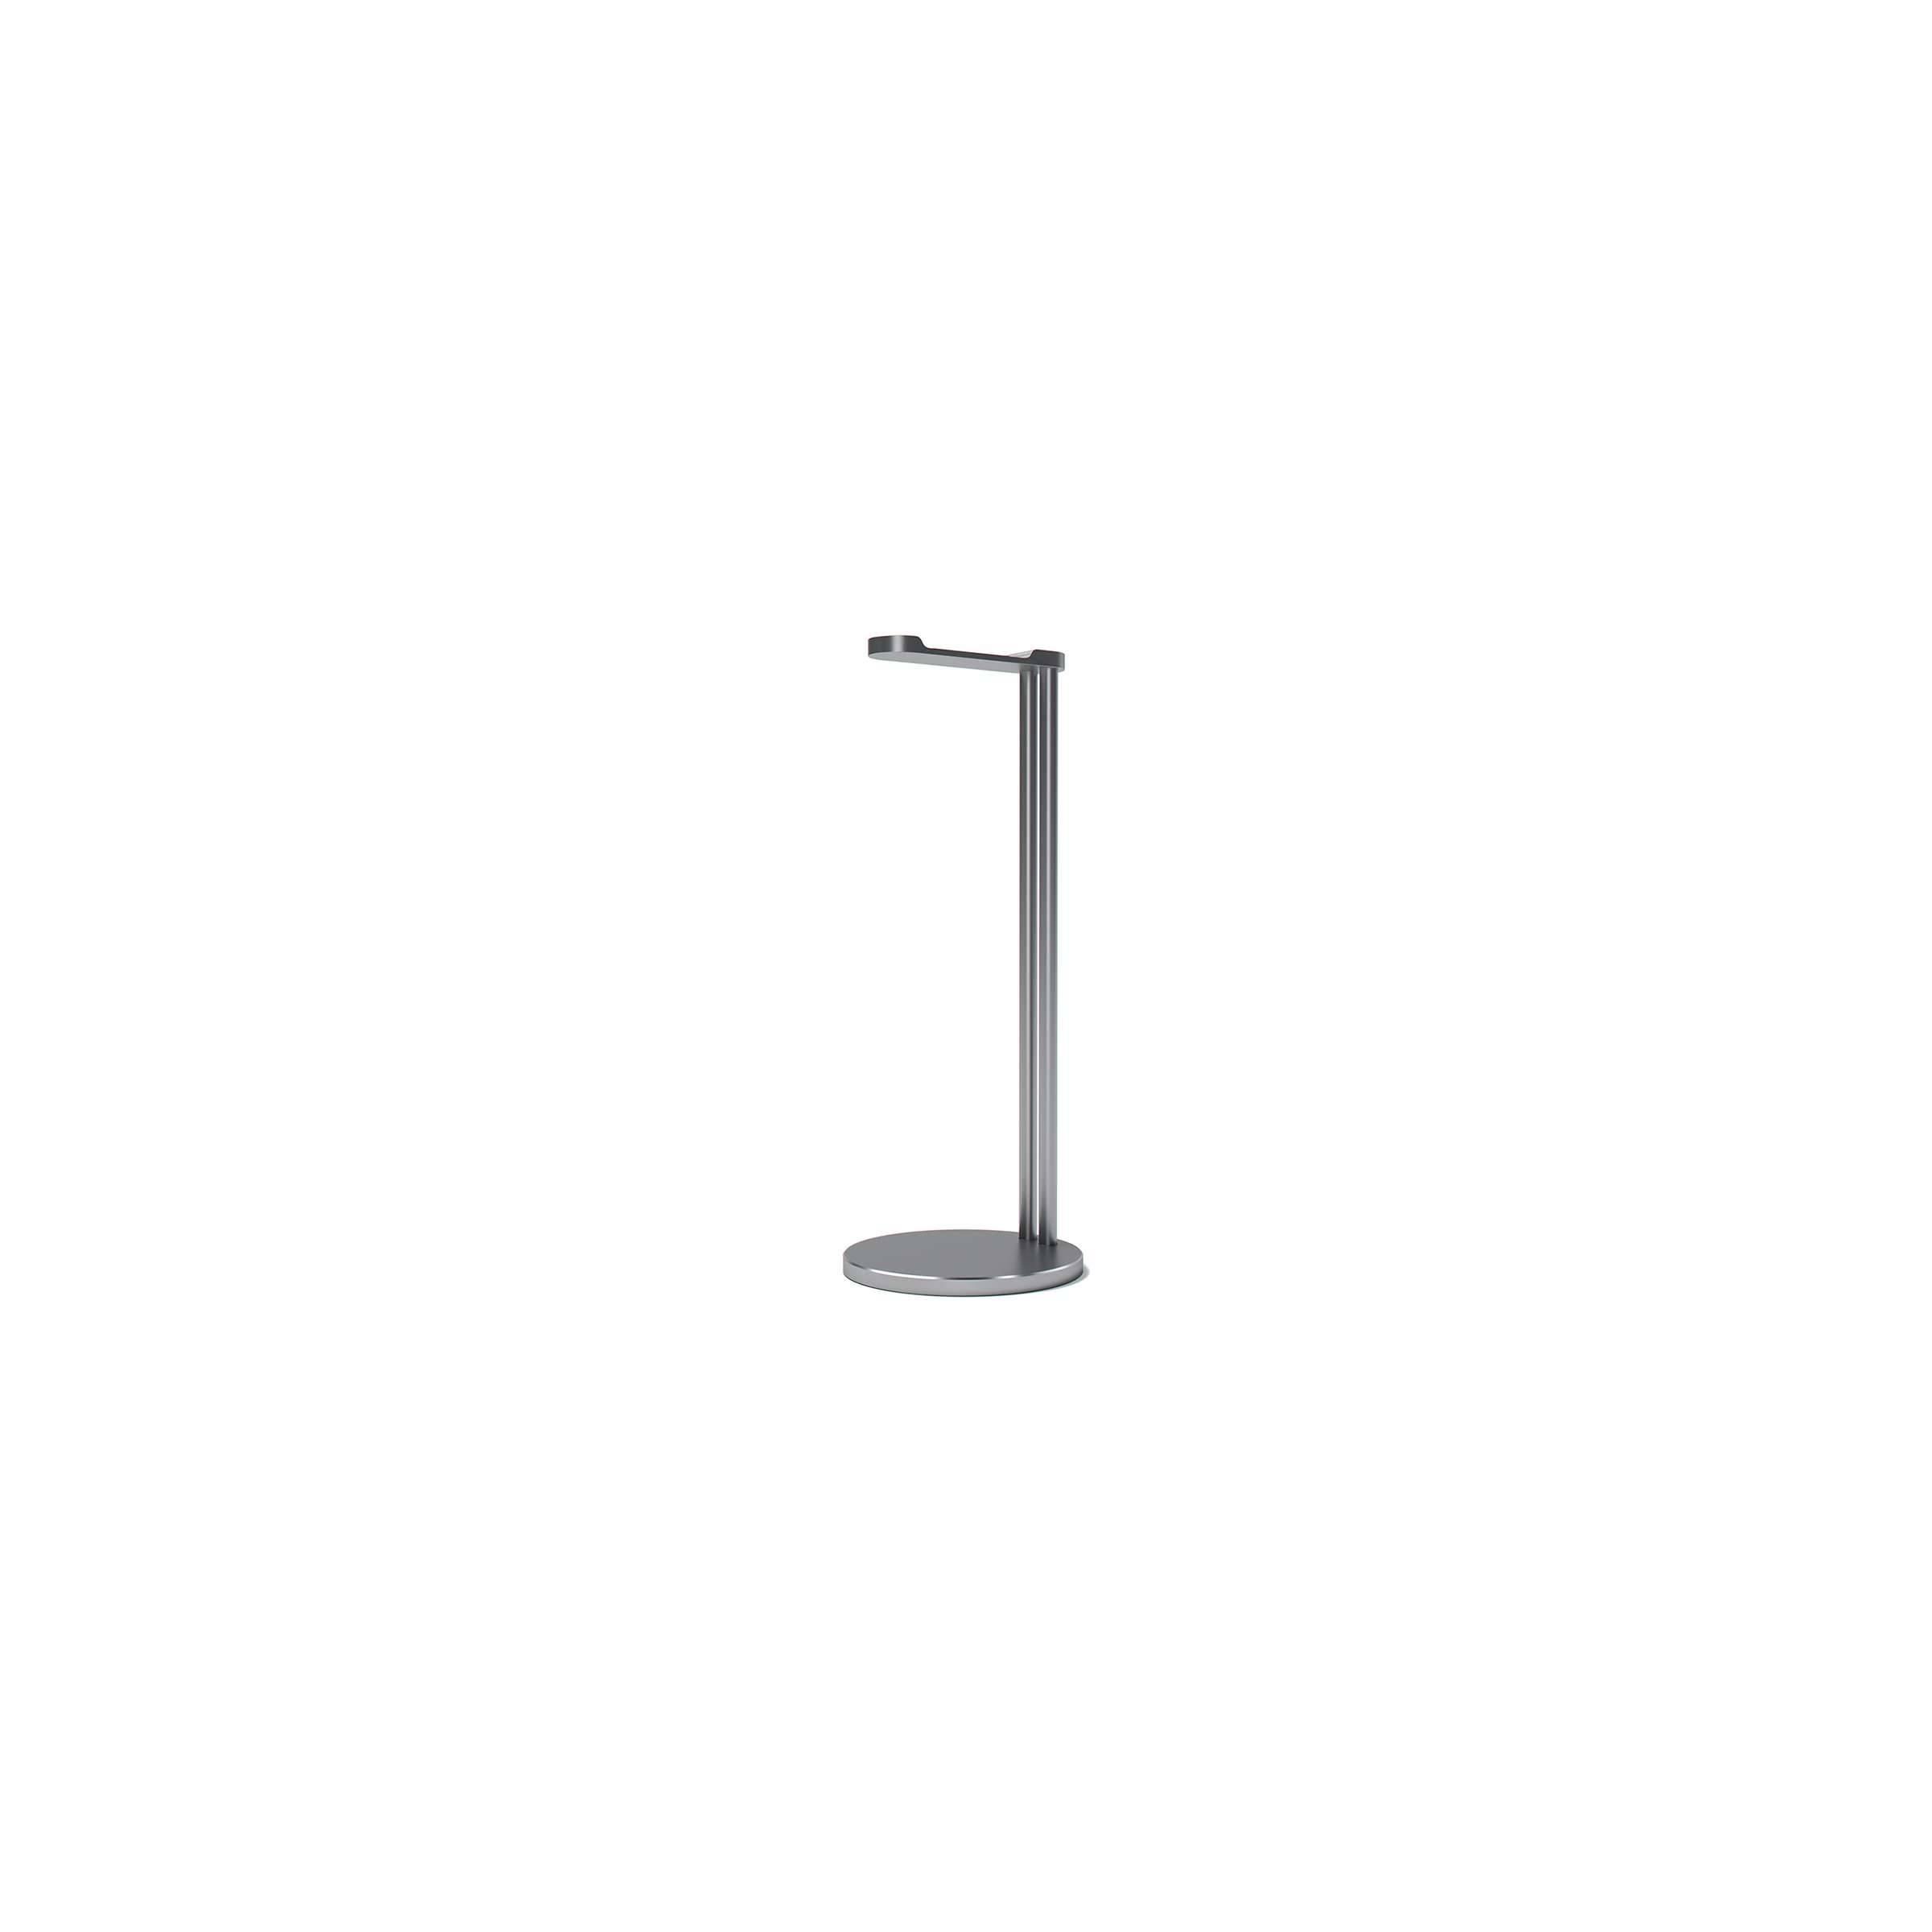 satechi – Satechi slim aluminium høretelefon stander farve space grey fra mackabler.dk